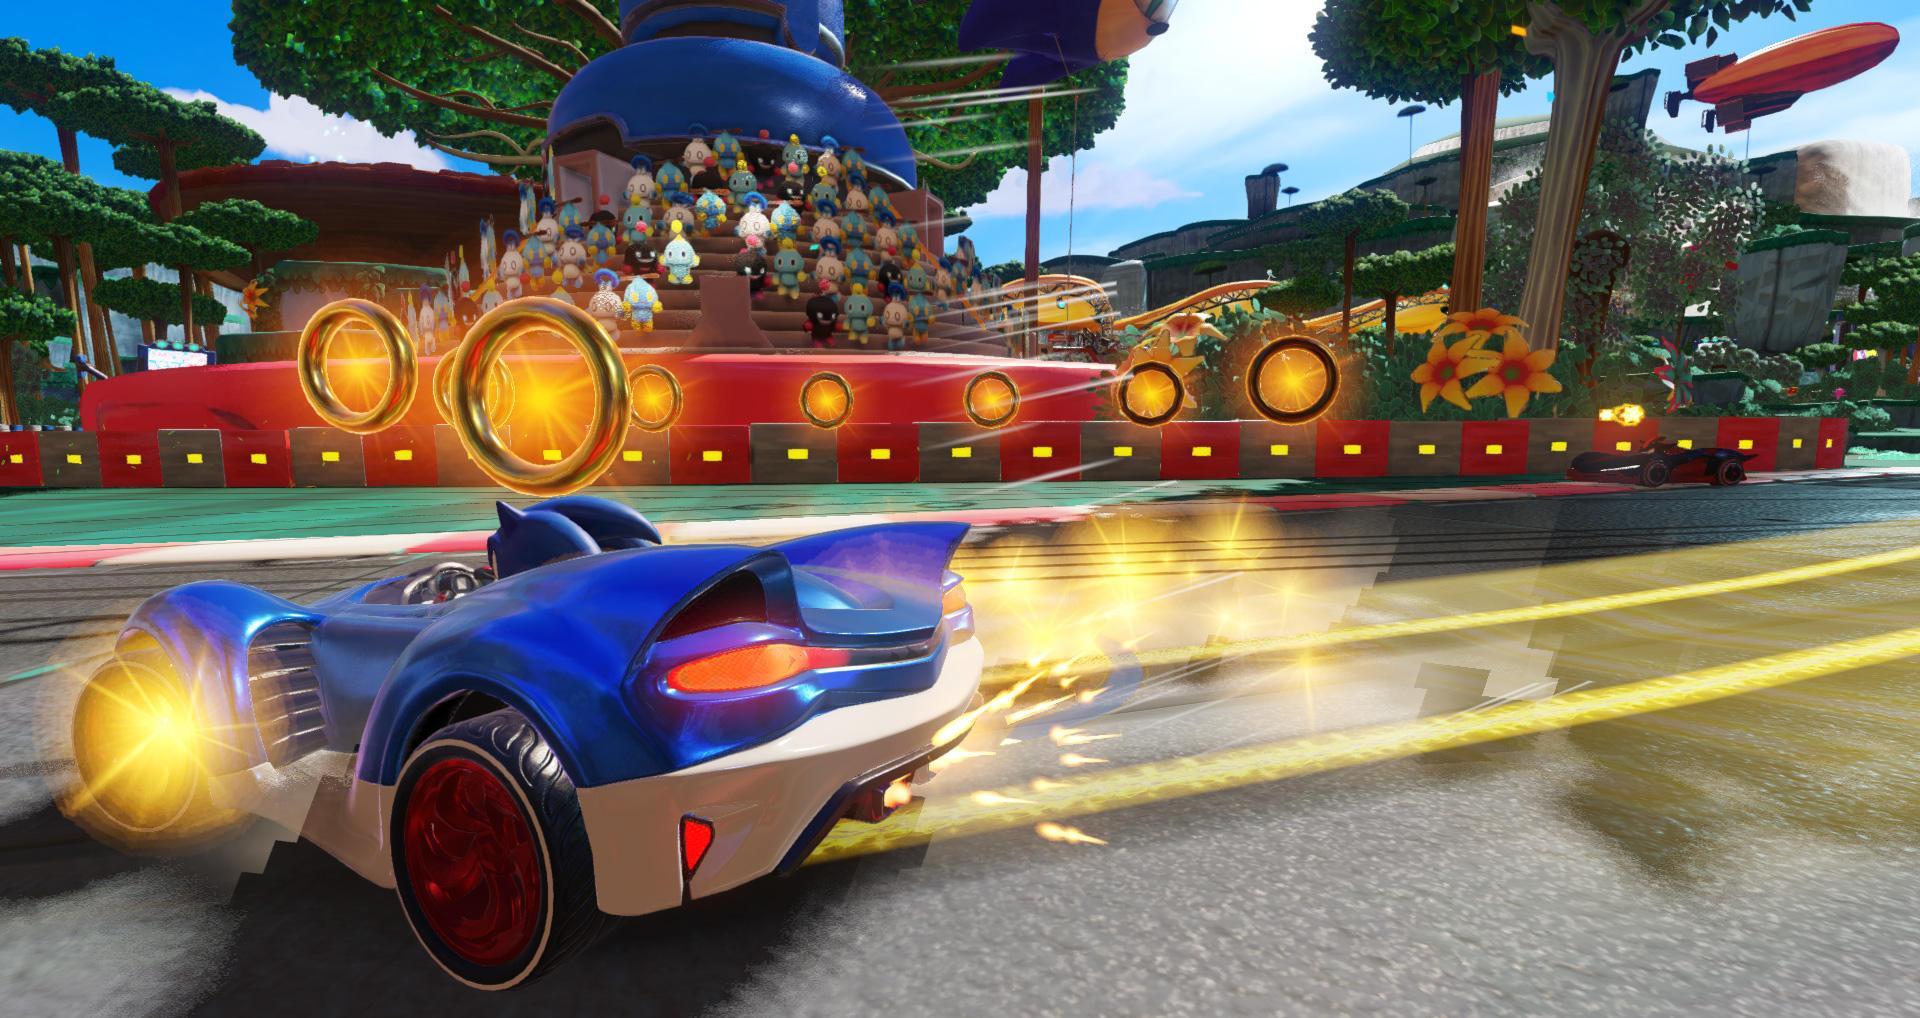 Le prime immagini di Team Sonic Racing